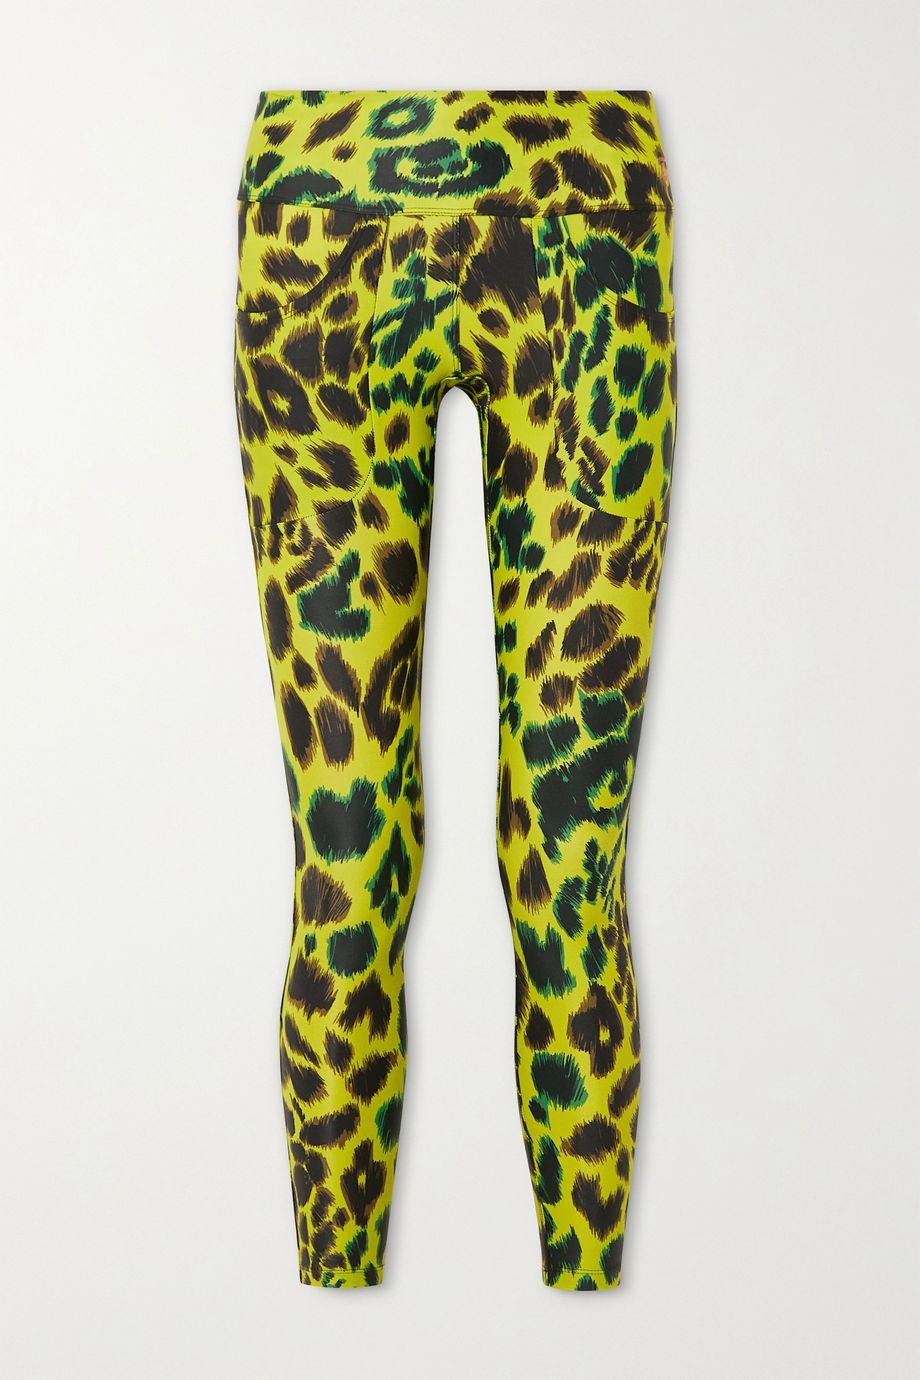 Twin Fantasy Leopard-print stretch leggings